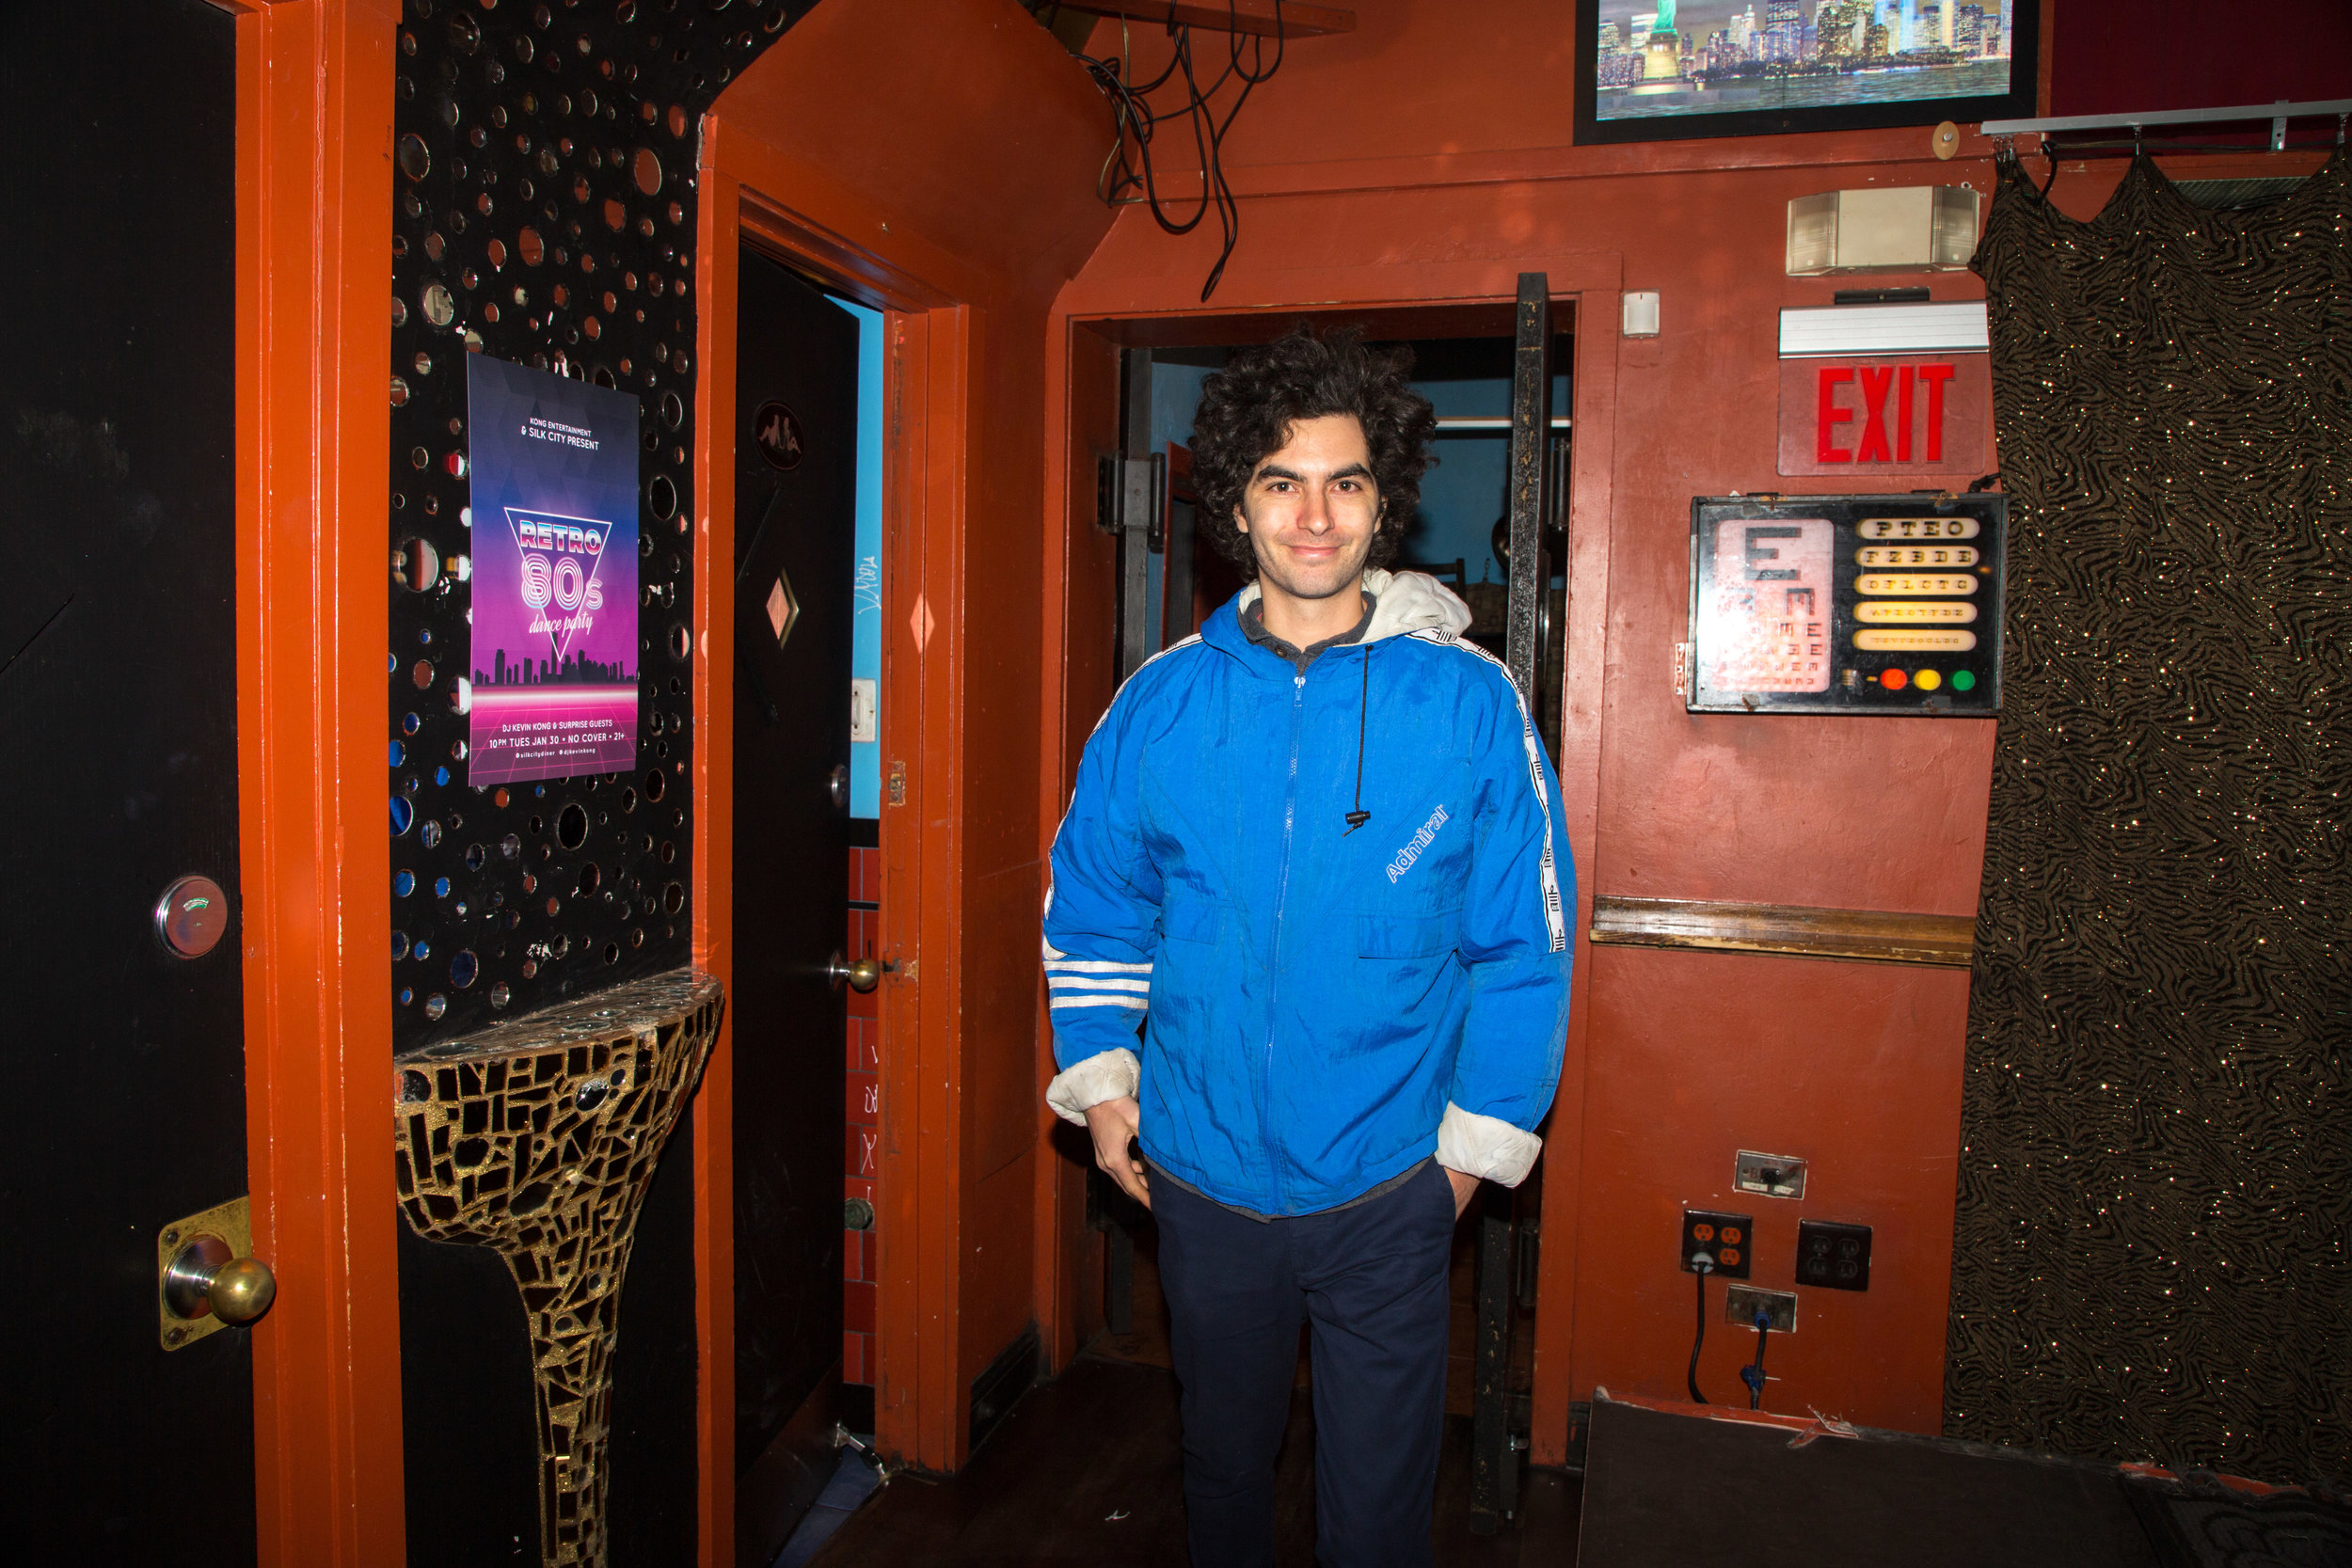 Taking a roadtrip to Philadephia, argonaut&wasp hits Silk City Diner in Philadelphia